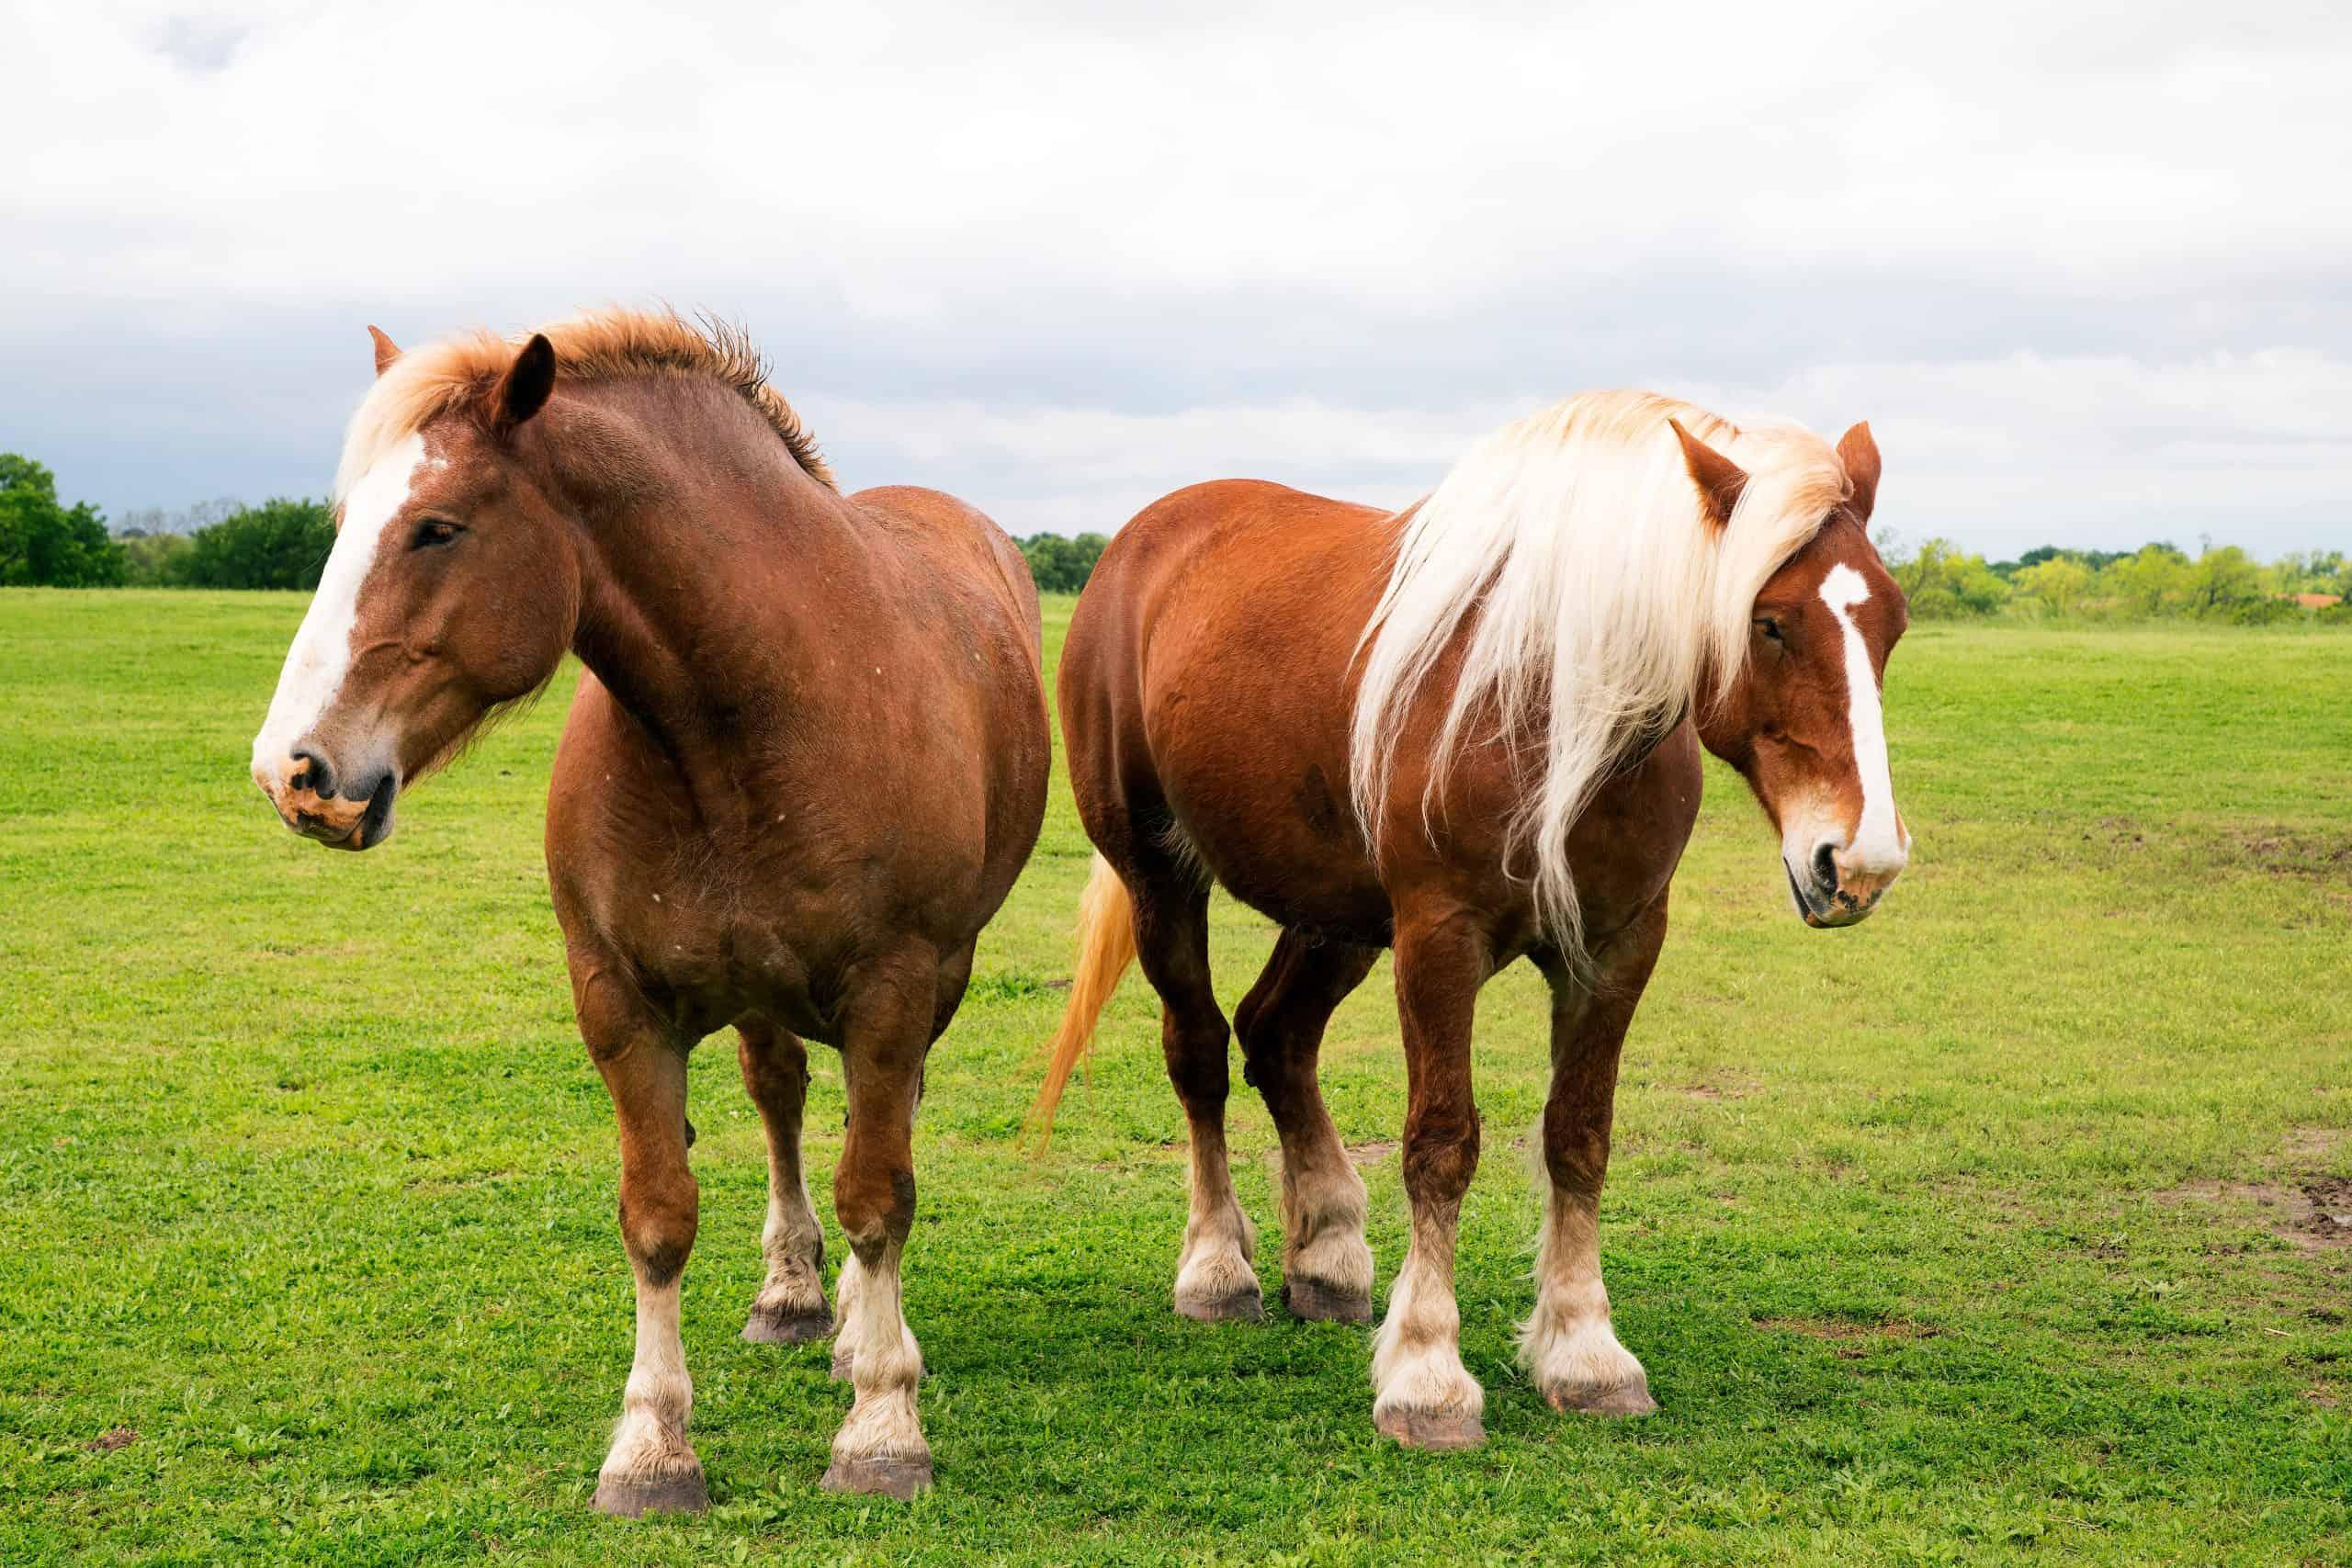 Belgian draft horses near Ennis, Texas